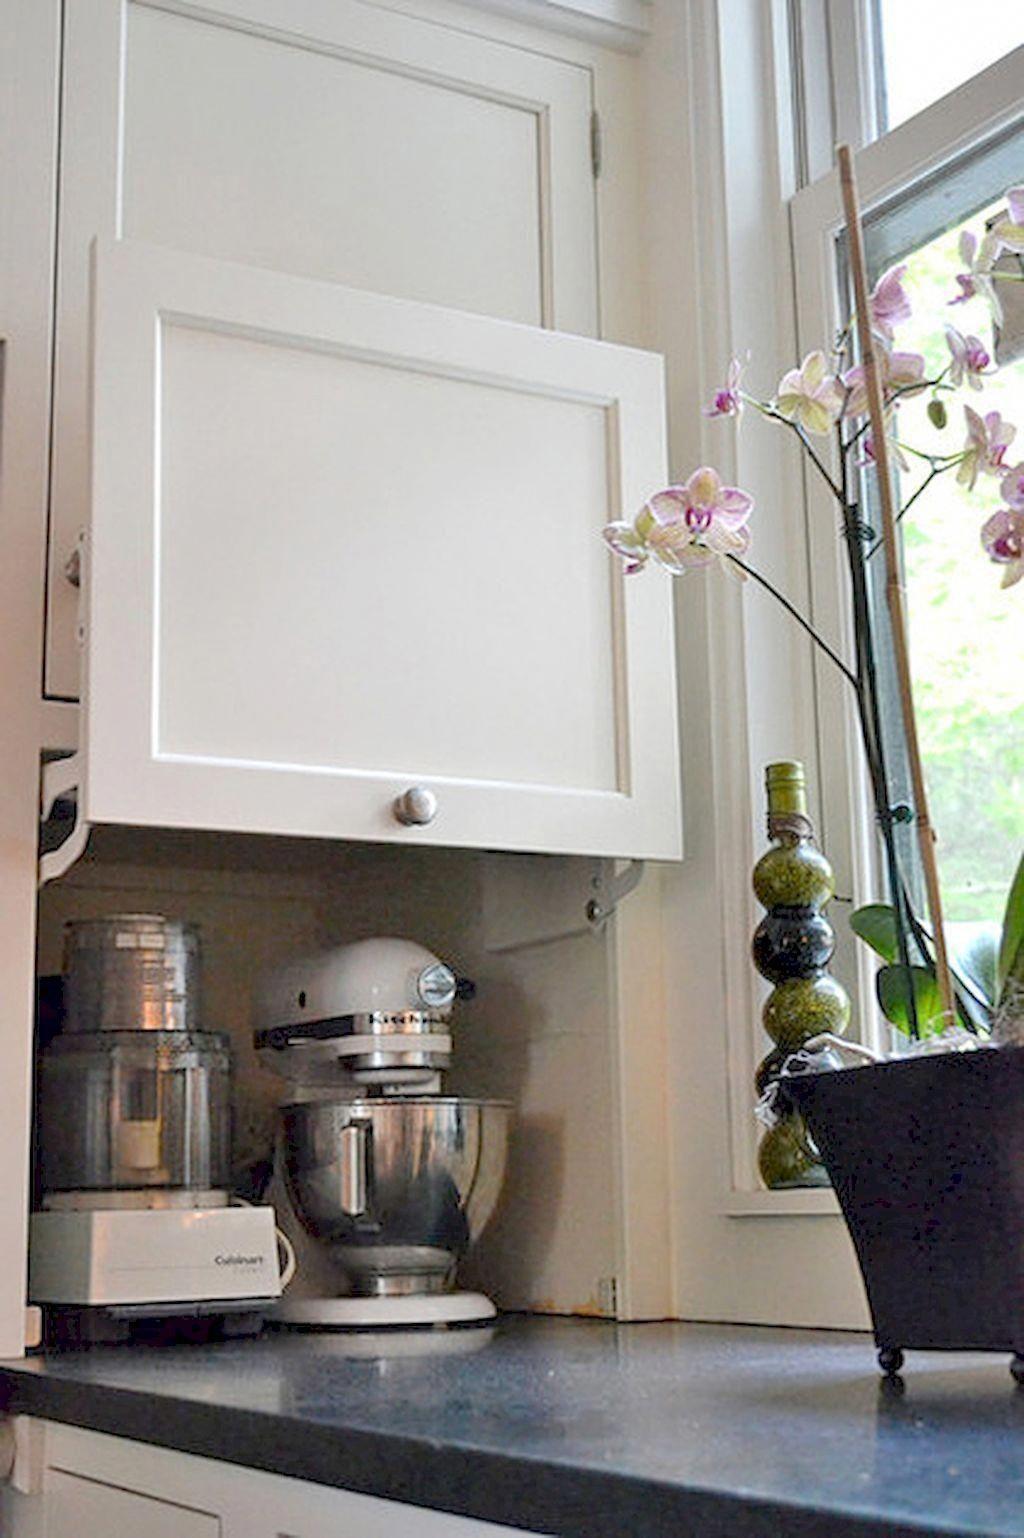 54 luxury farmhouse kitchen cabinet makeover design ideas farmhouse kitchencabinetsmakeover on farmhouse kitchen shelf decor id=58514